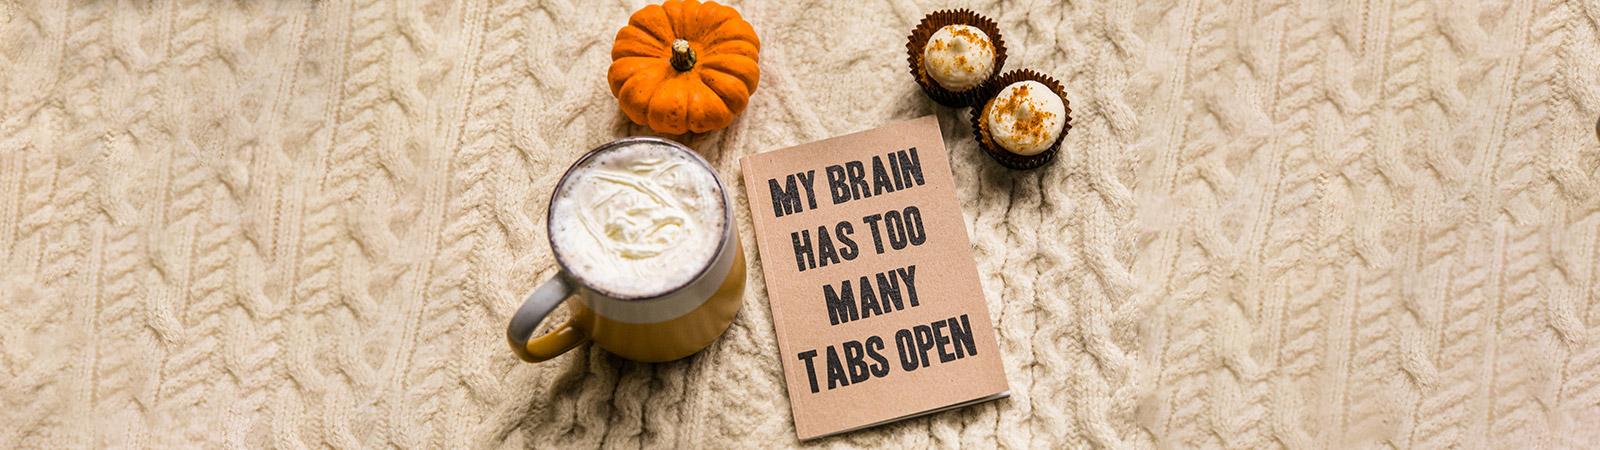 Maintaining Brain Health